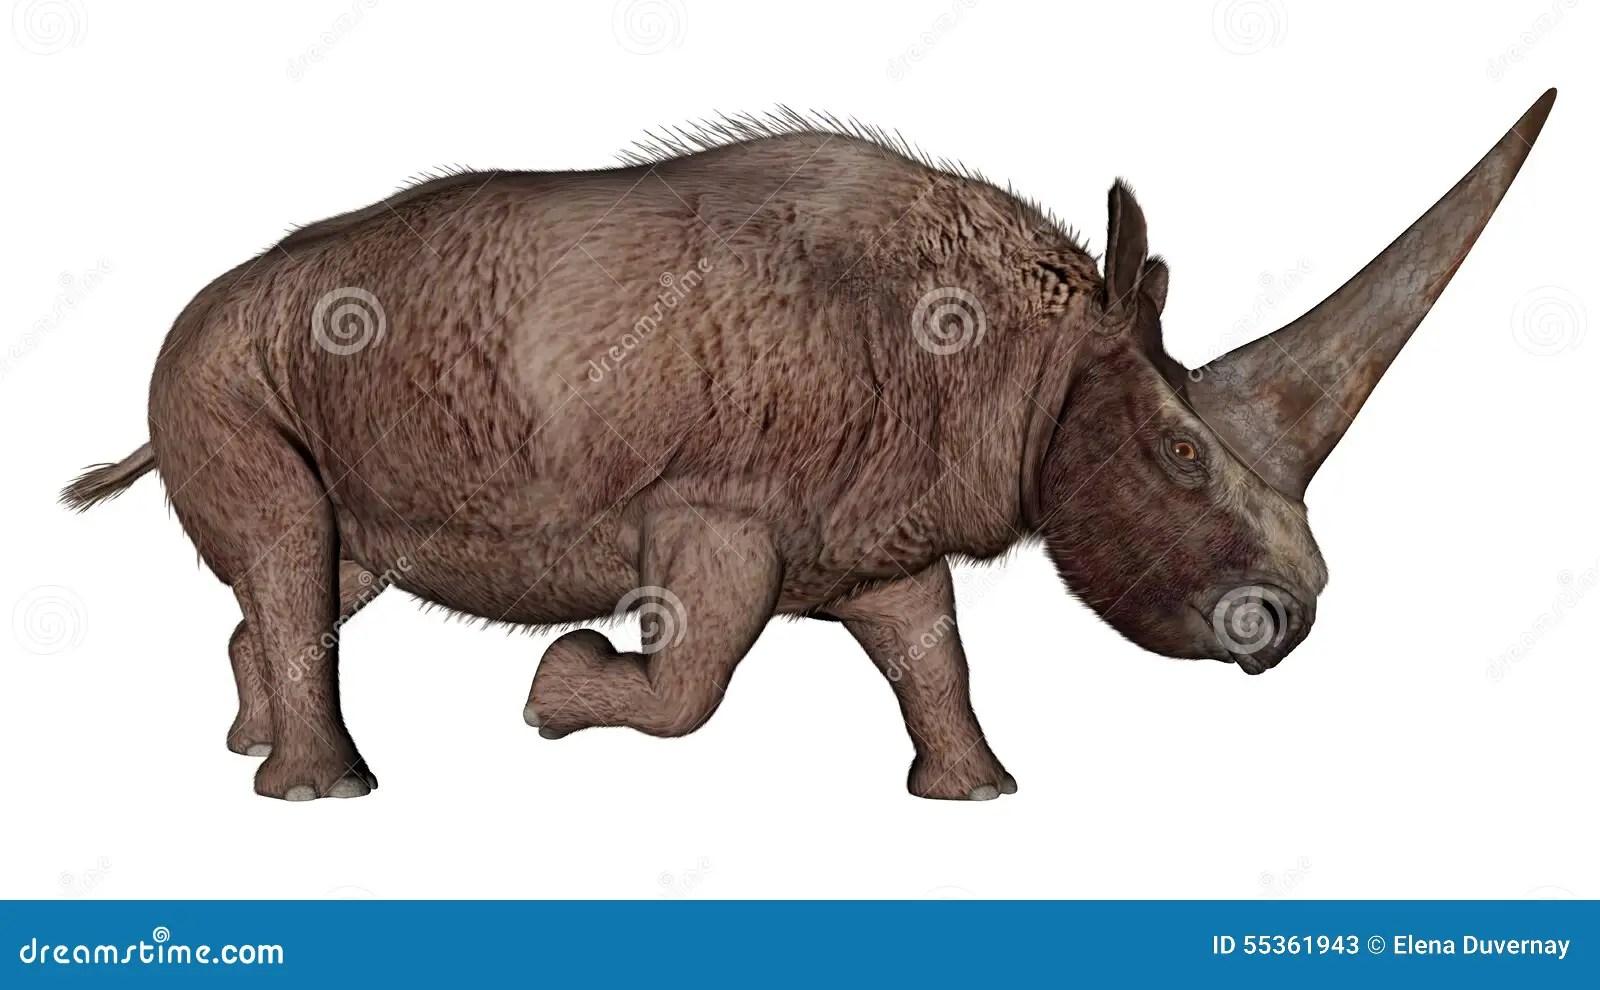 Walking With Dinosaurs 3d Wallpaper Elasmotherium Dinosaur Rhinoceros 3d Render Stock